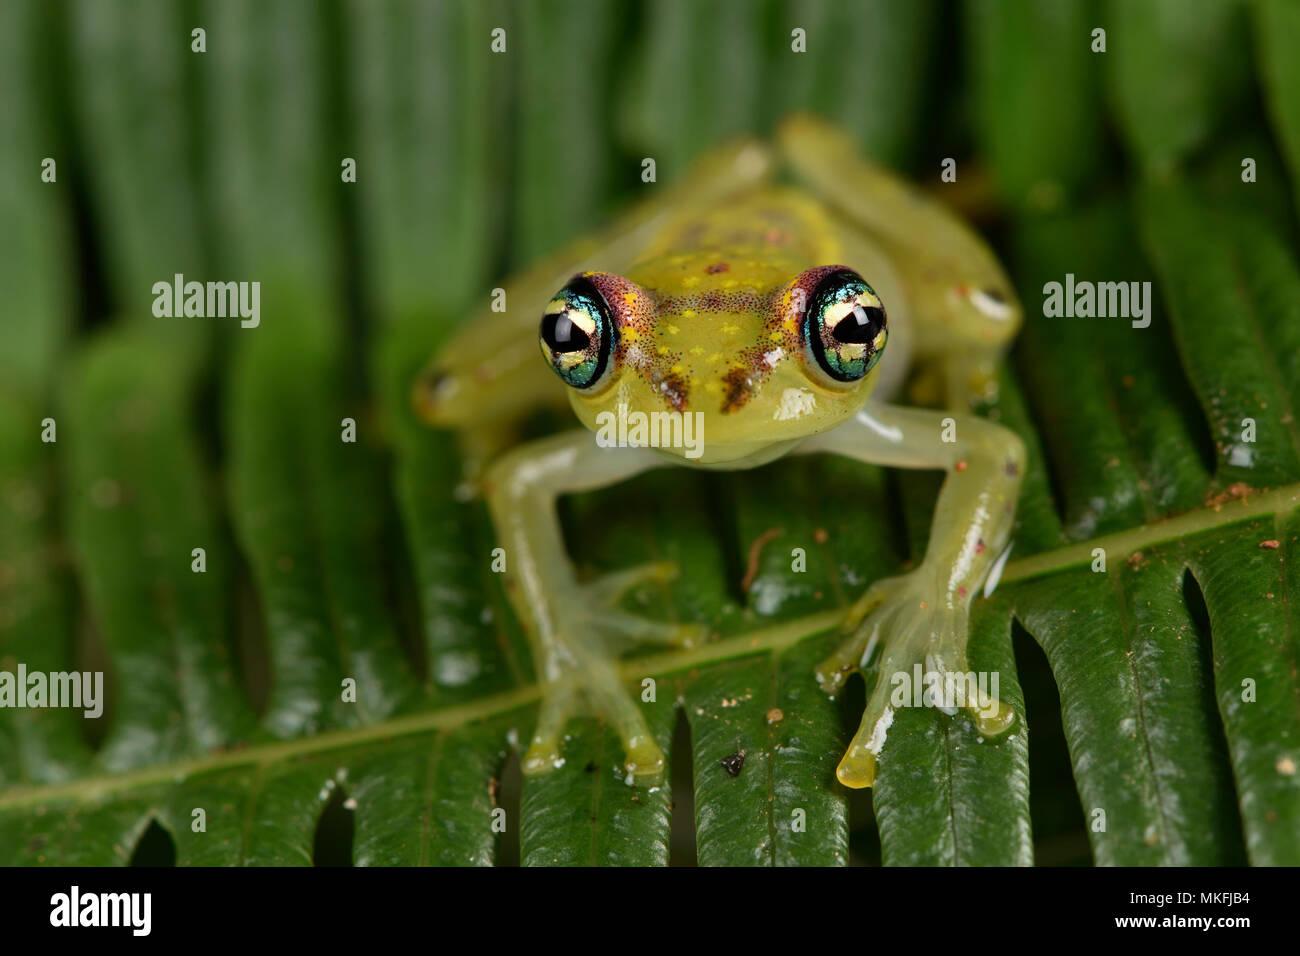 Zentrale Bright-eyed Frog (Boophis rappiodes), Andasibe, Perinet, Alaotra-Mangoro Region, Madagaskar Stockbild